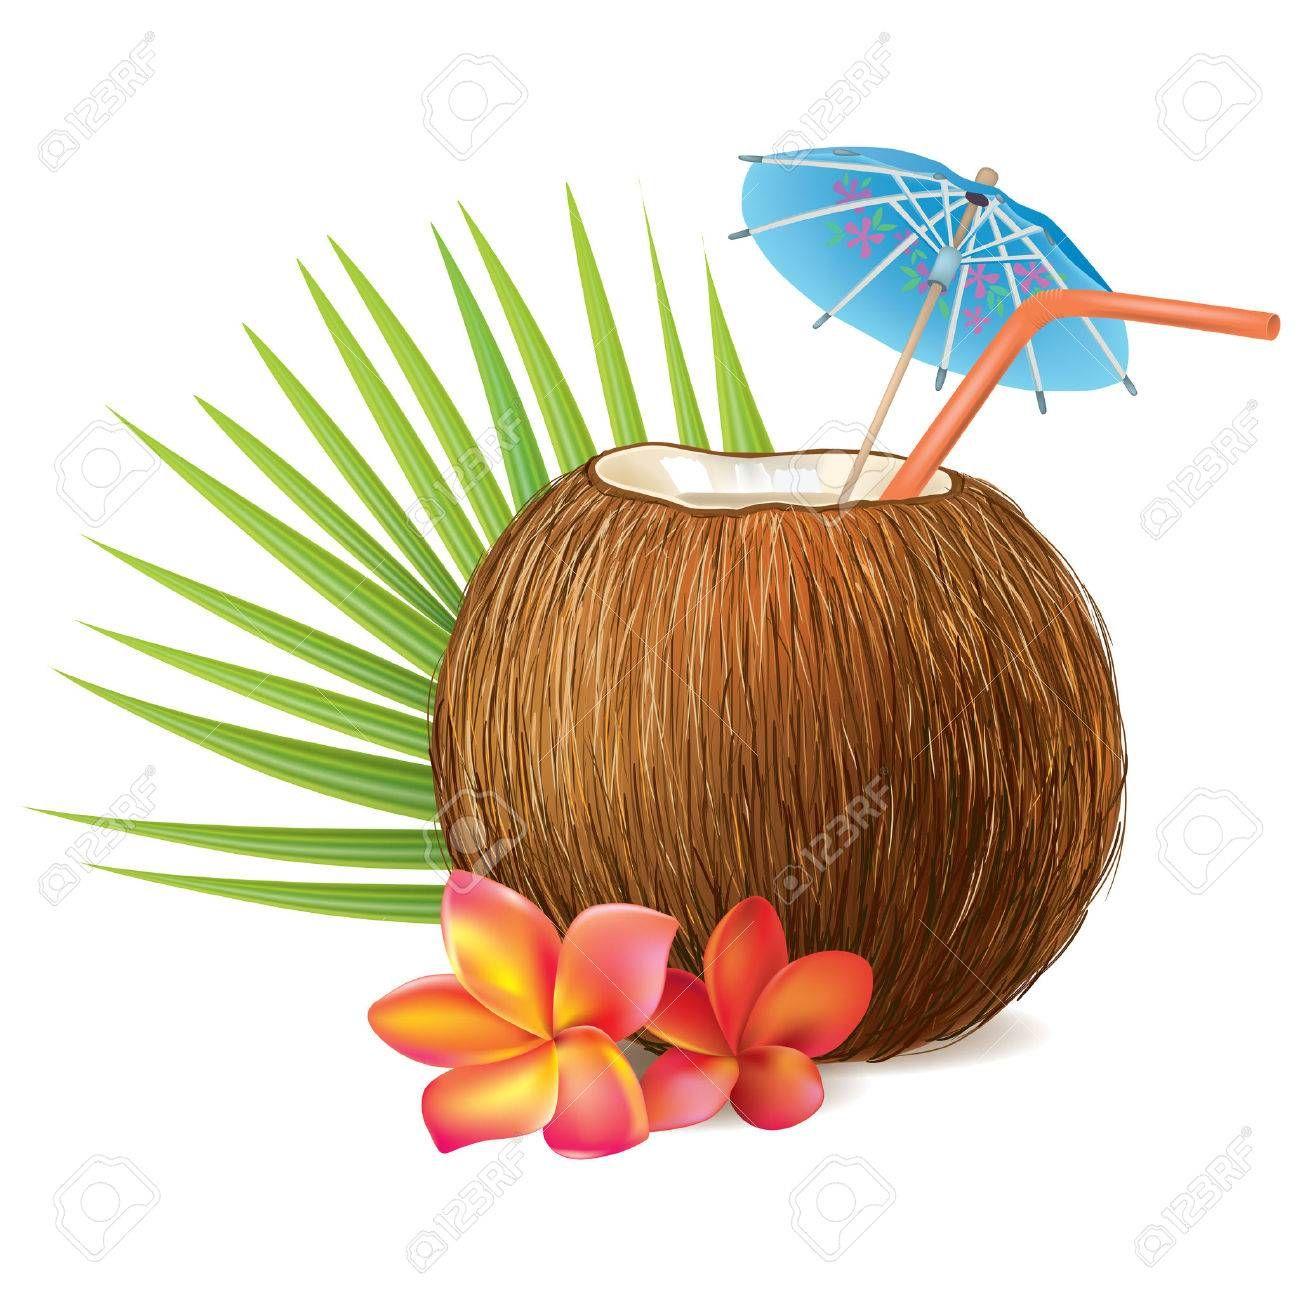 Imagen Relacionada Coconut Drinks Coconut Downloadable Art